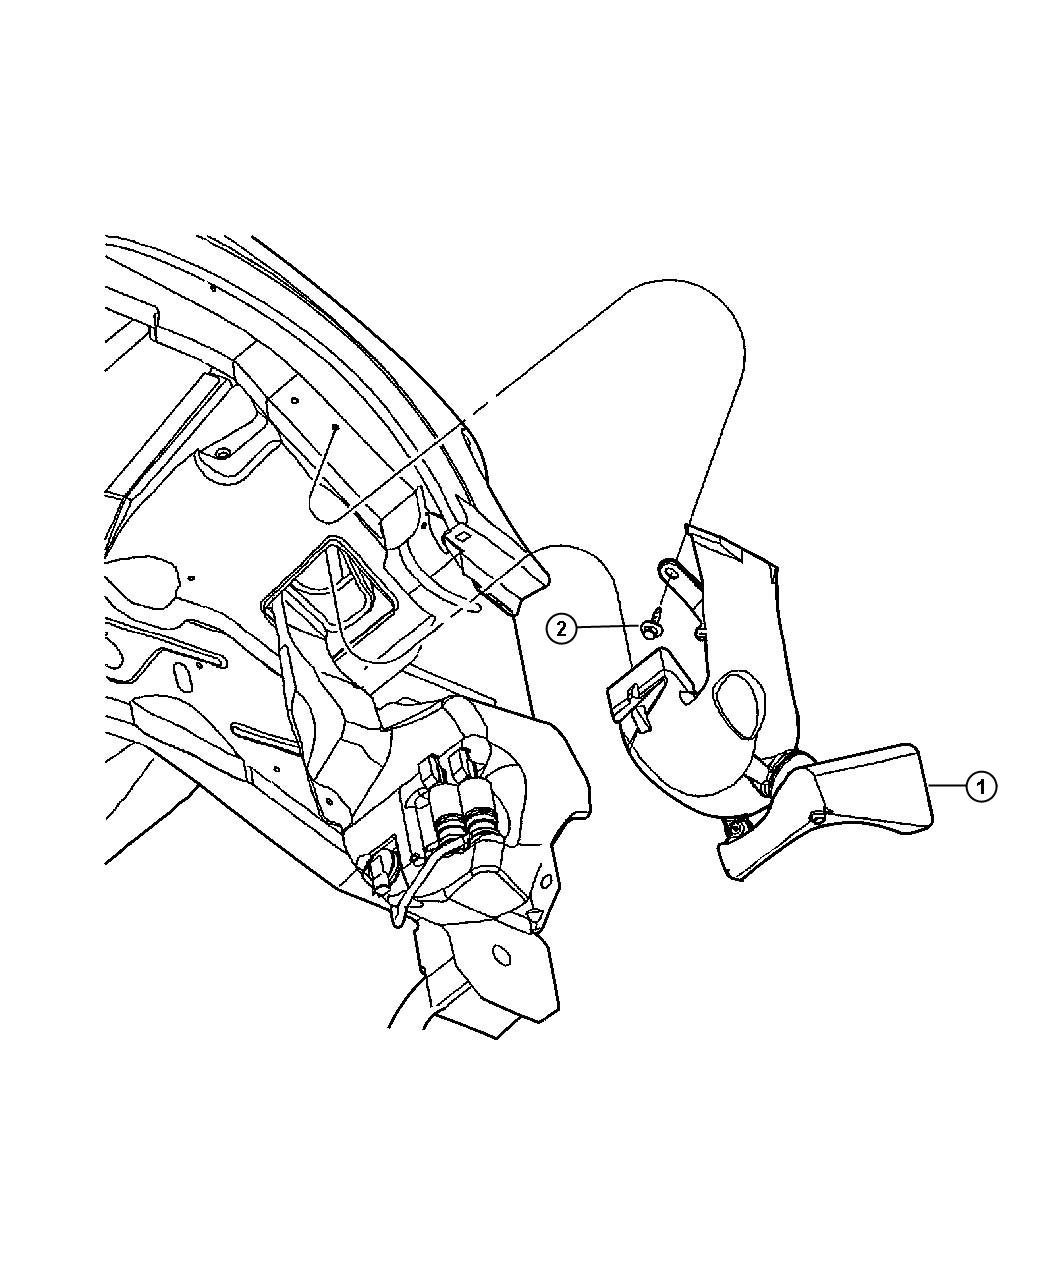 2011 Dodge NITRO Duct. Fresh air. Instrument, fuel, panel